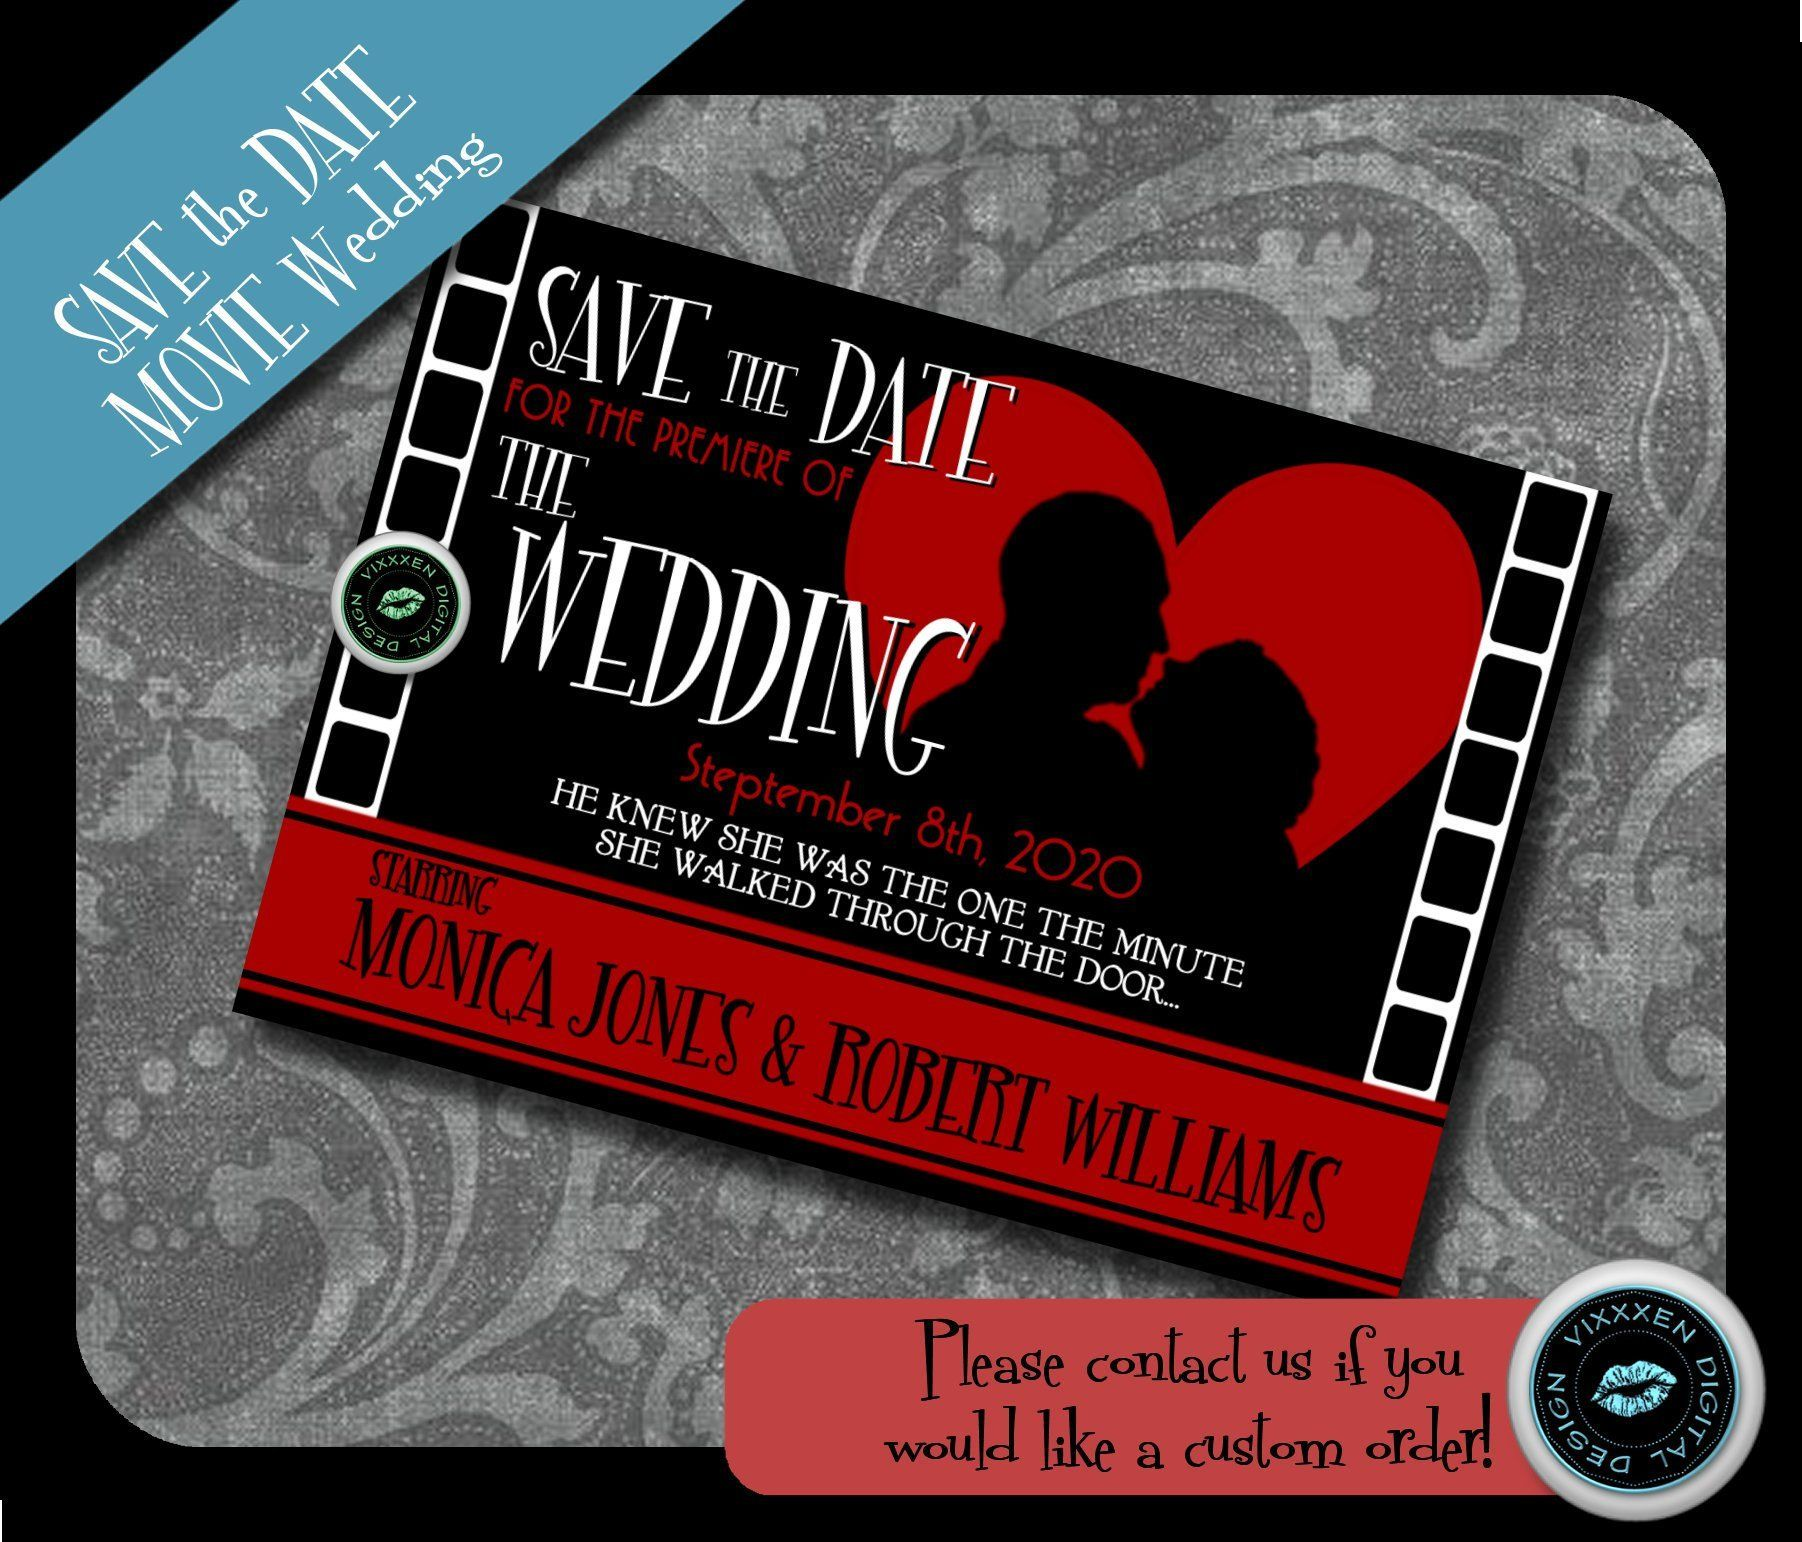 Wedding Save the date romantic film wedding couple Movie poster ...